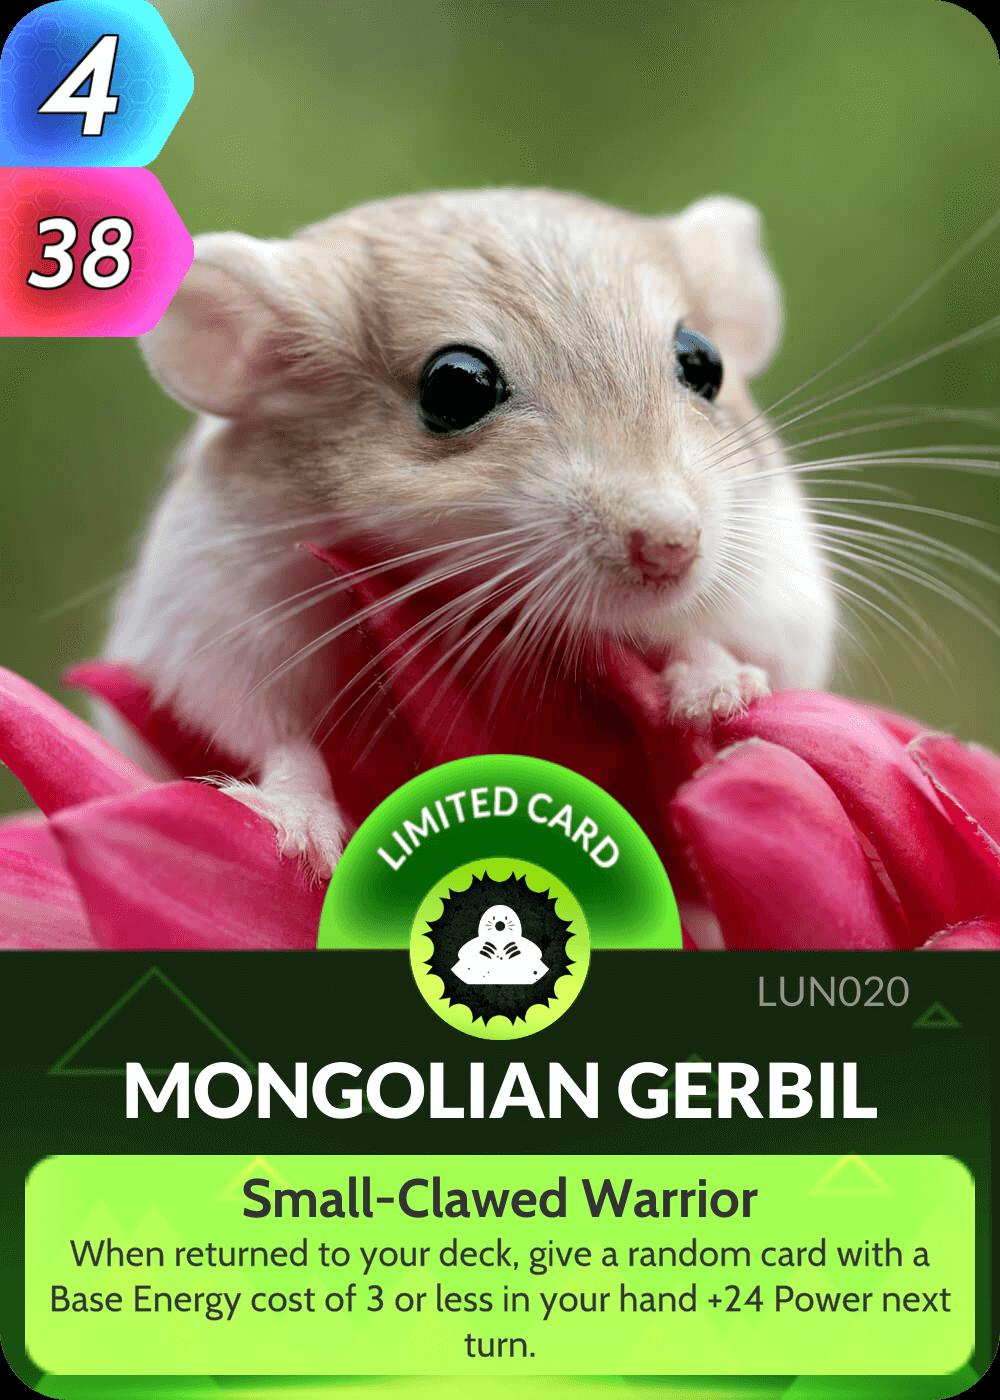 Mongolian Gerbil